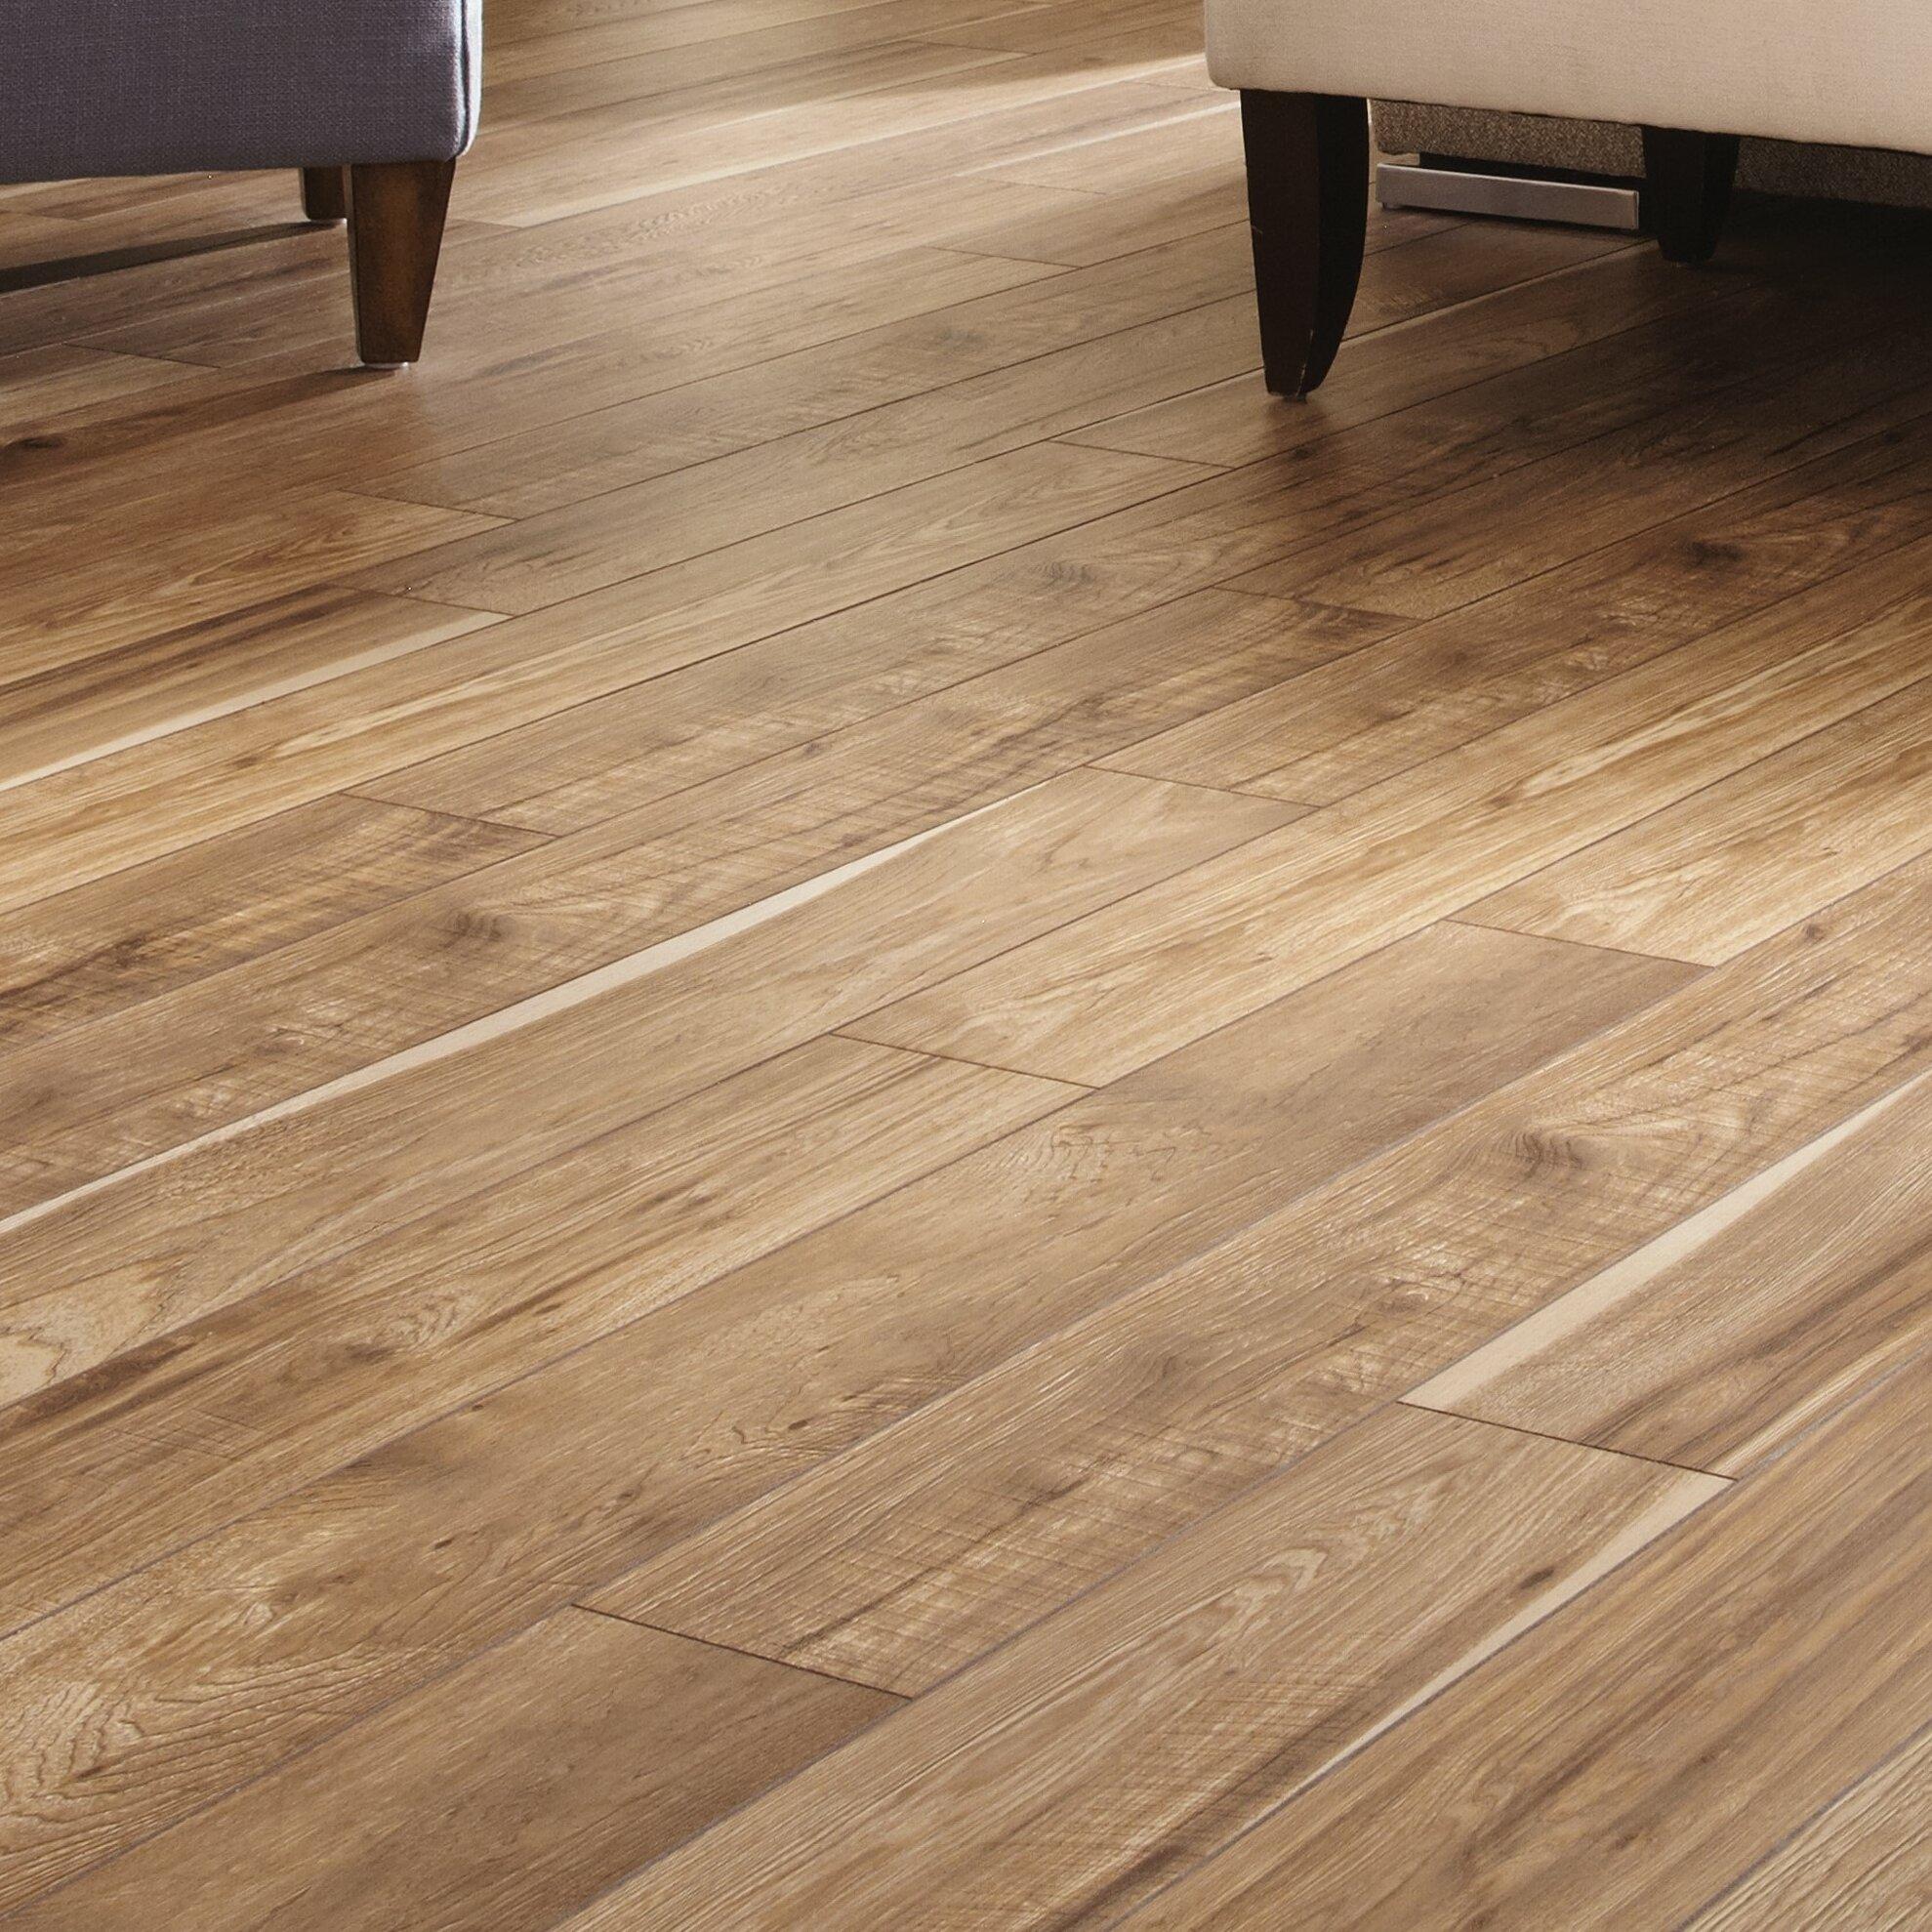 Mannington Restoration 6 X 51 12mm Hickory Laminate Flooring In Natural Wayfair